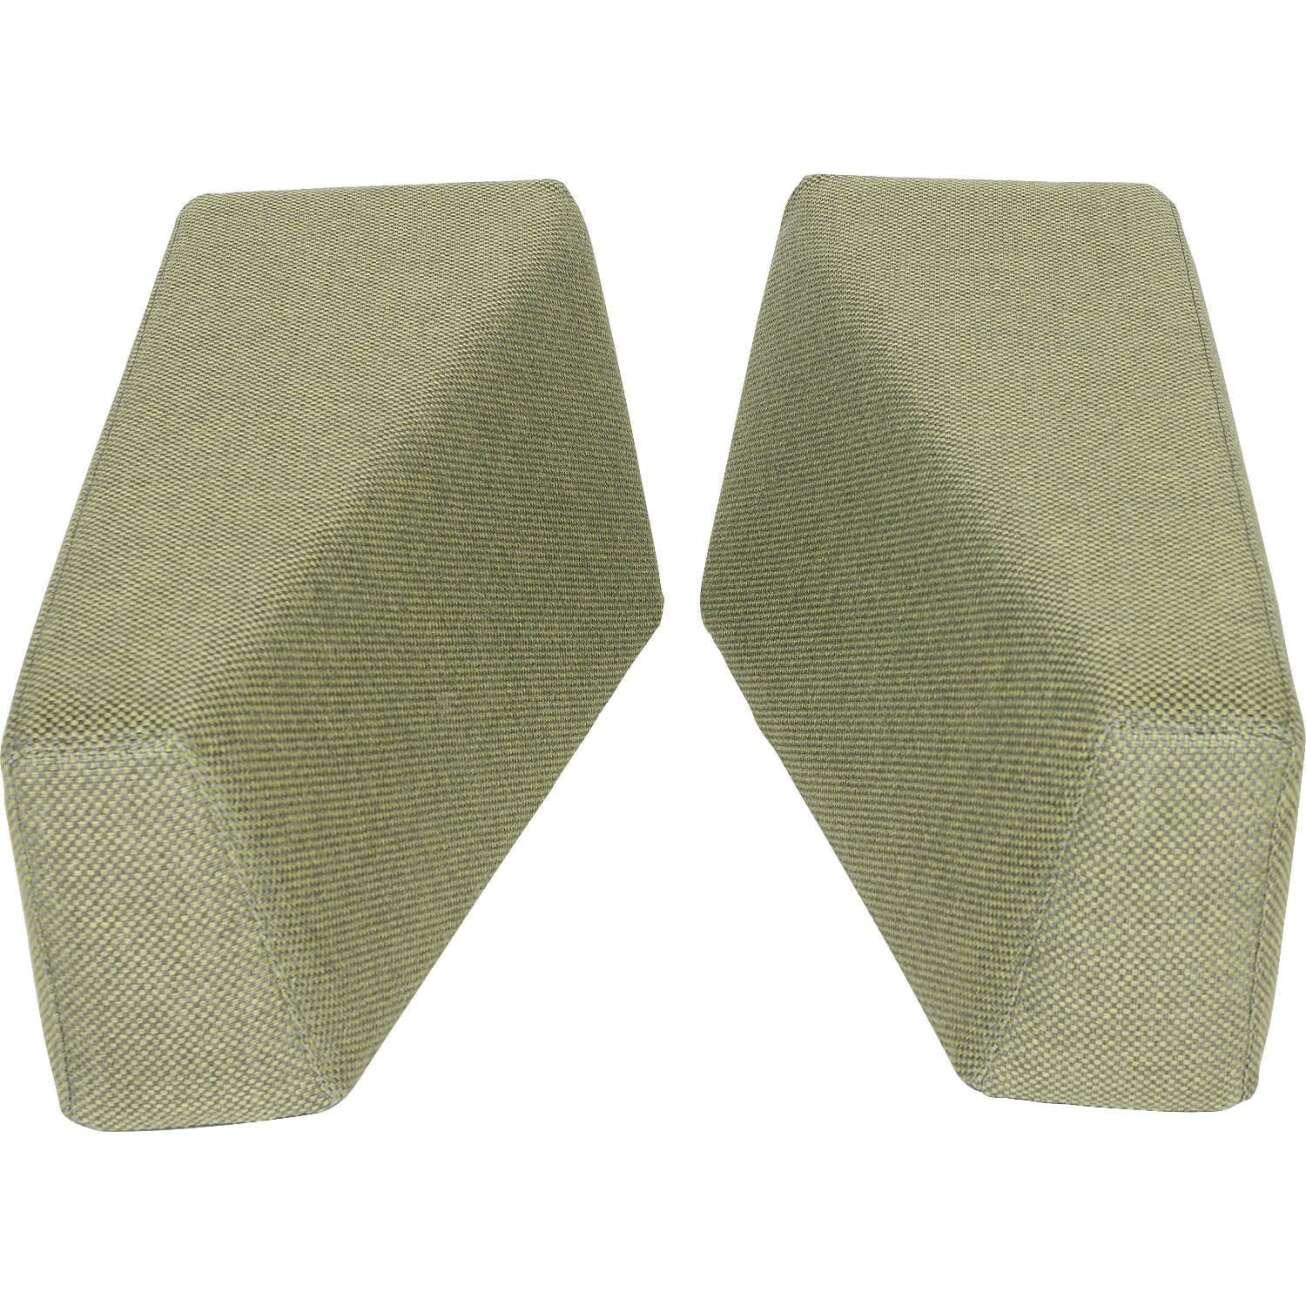 Sundays Frame sofaputer til armlene - grønn